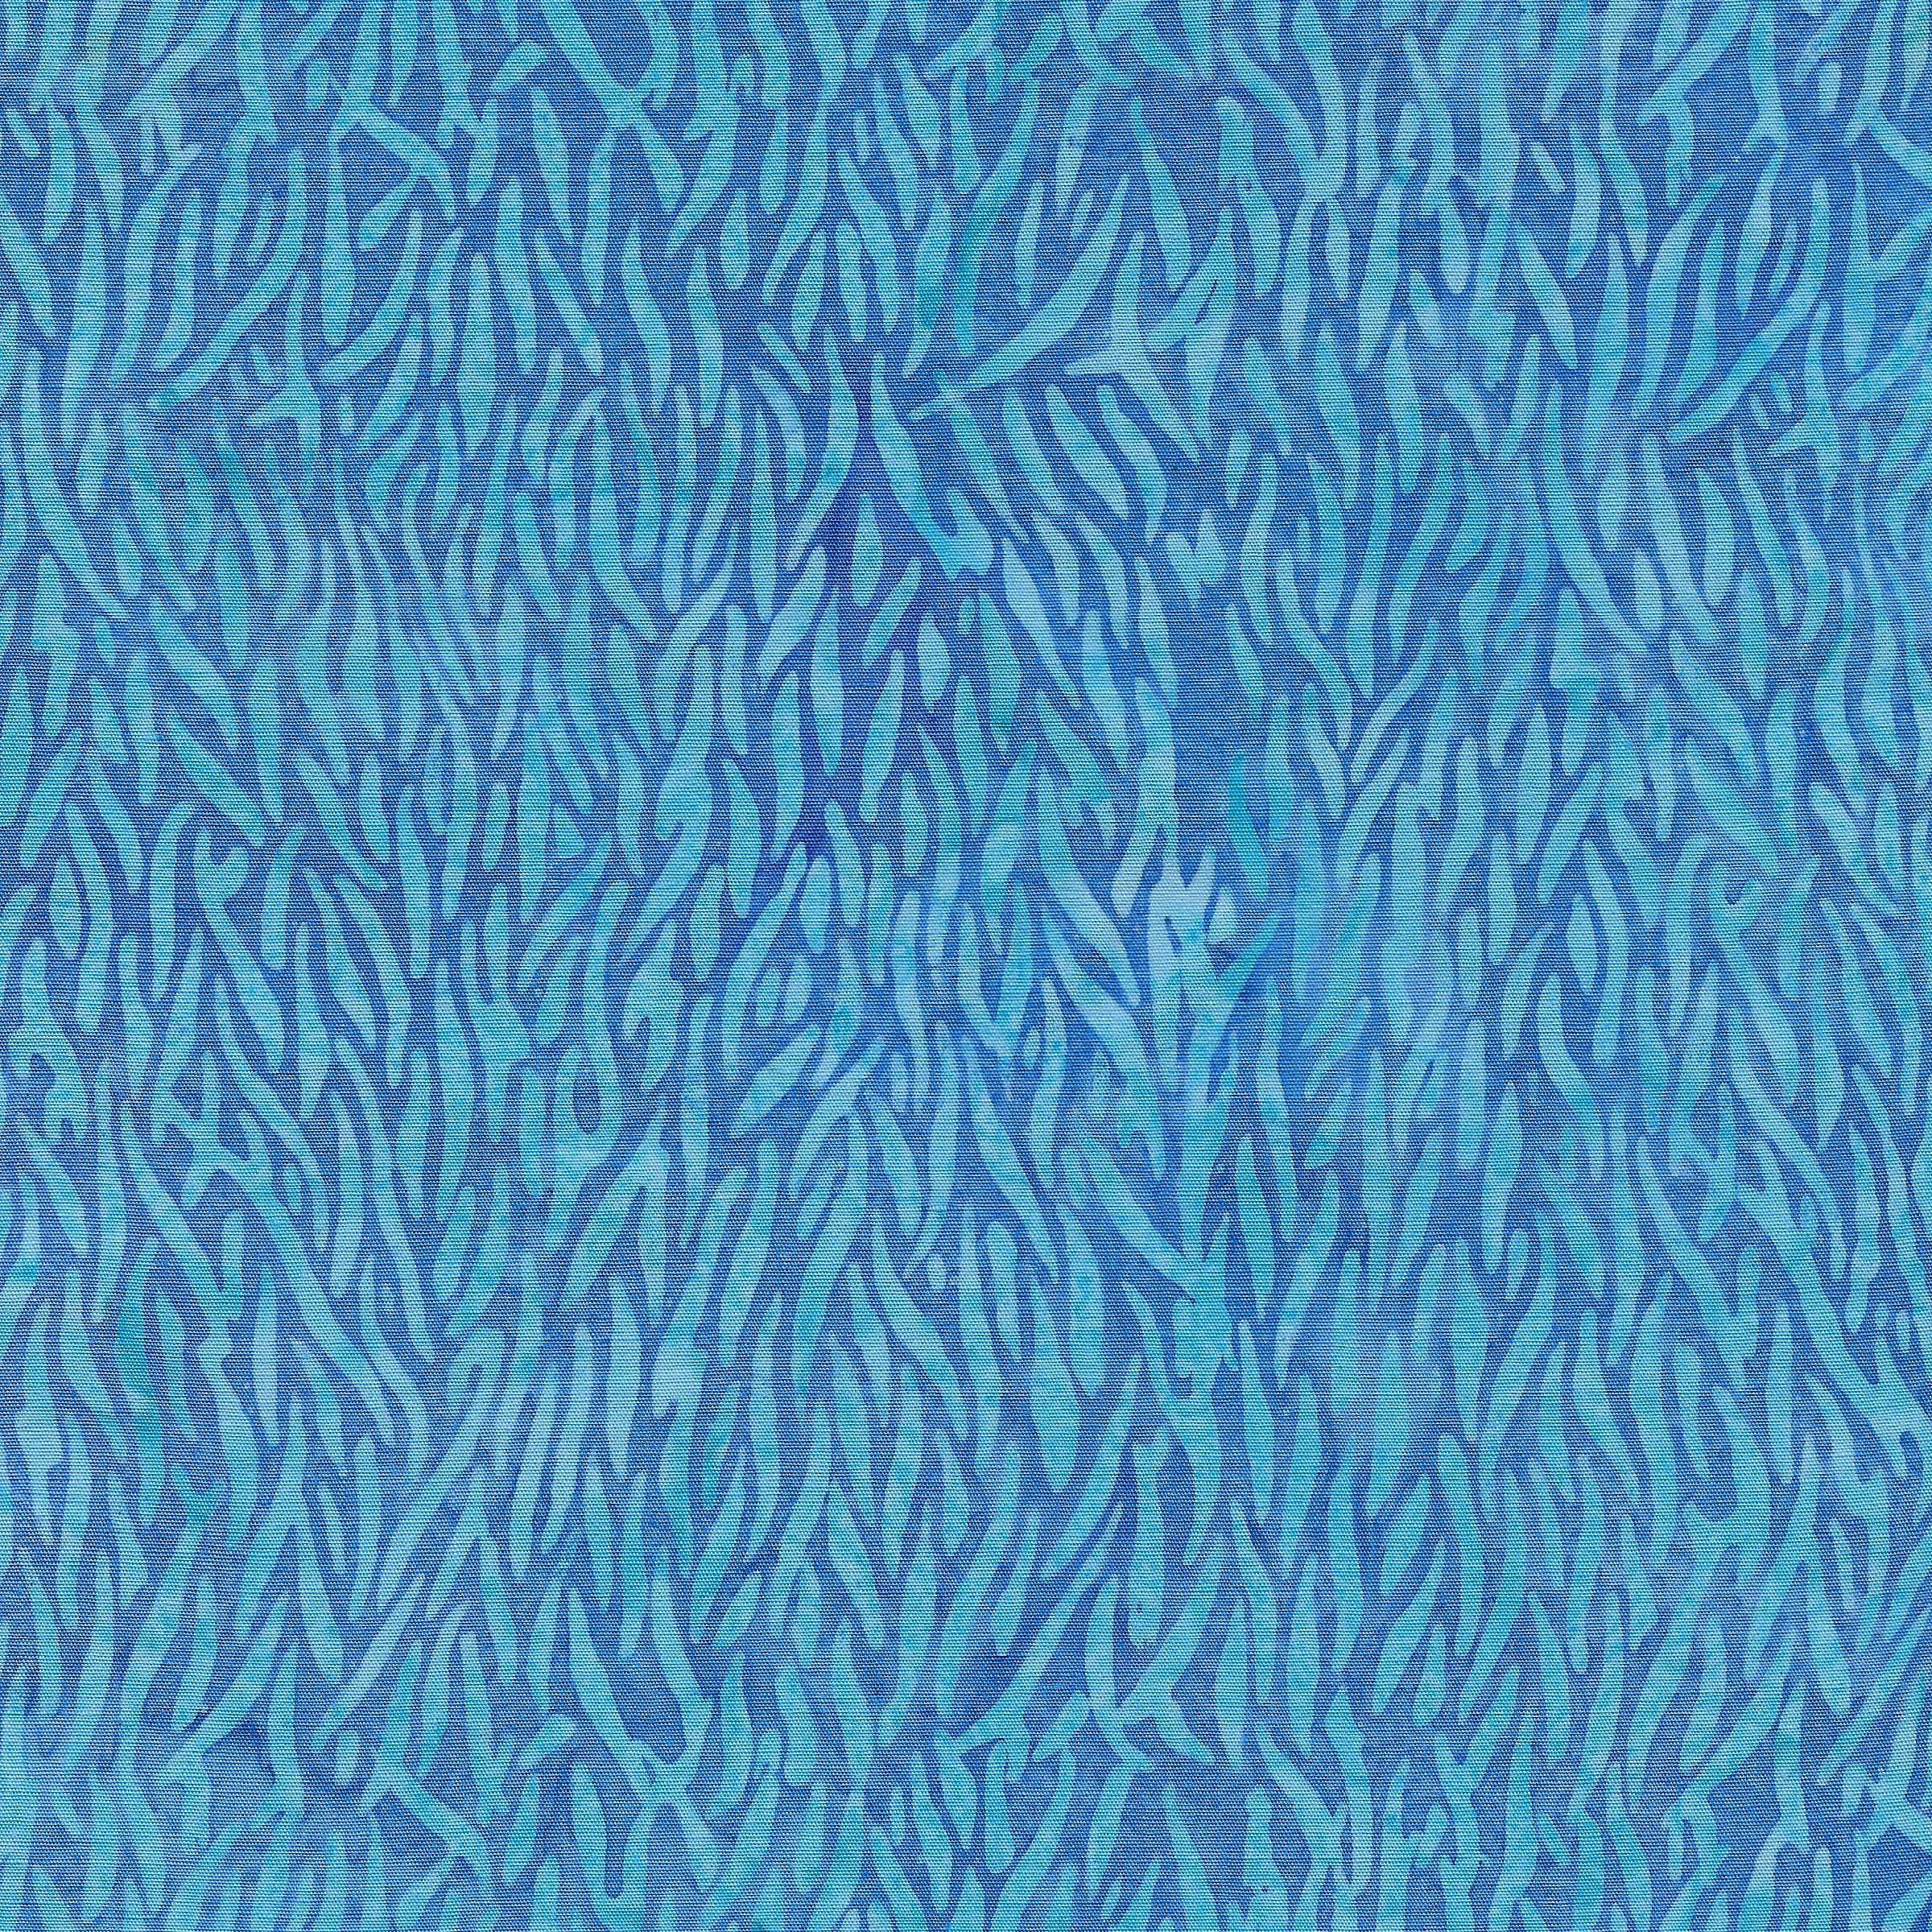 111901523 / Kelp-Surf